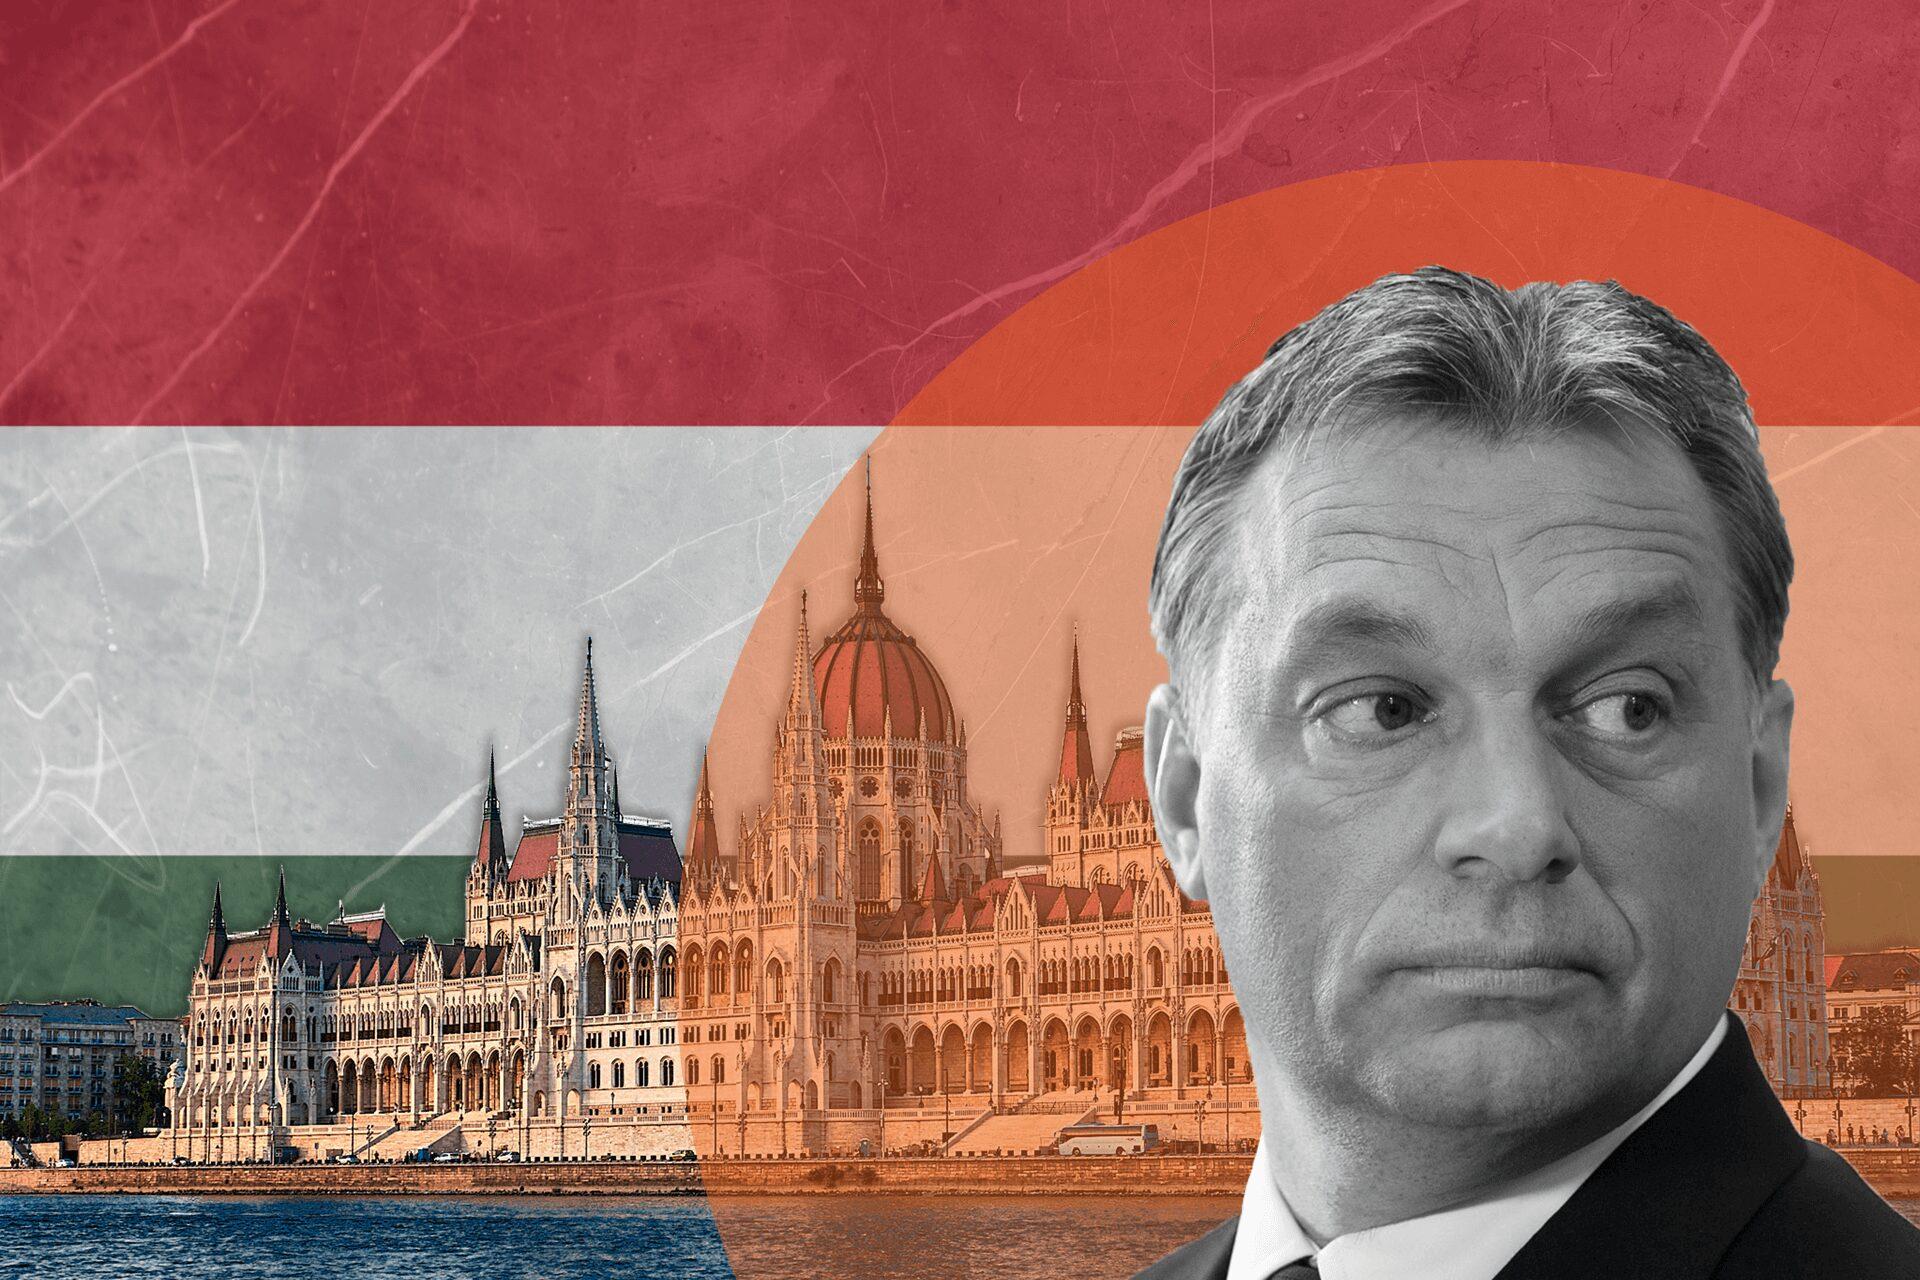 Dismantling Democracy: The Orbánization of Hungary